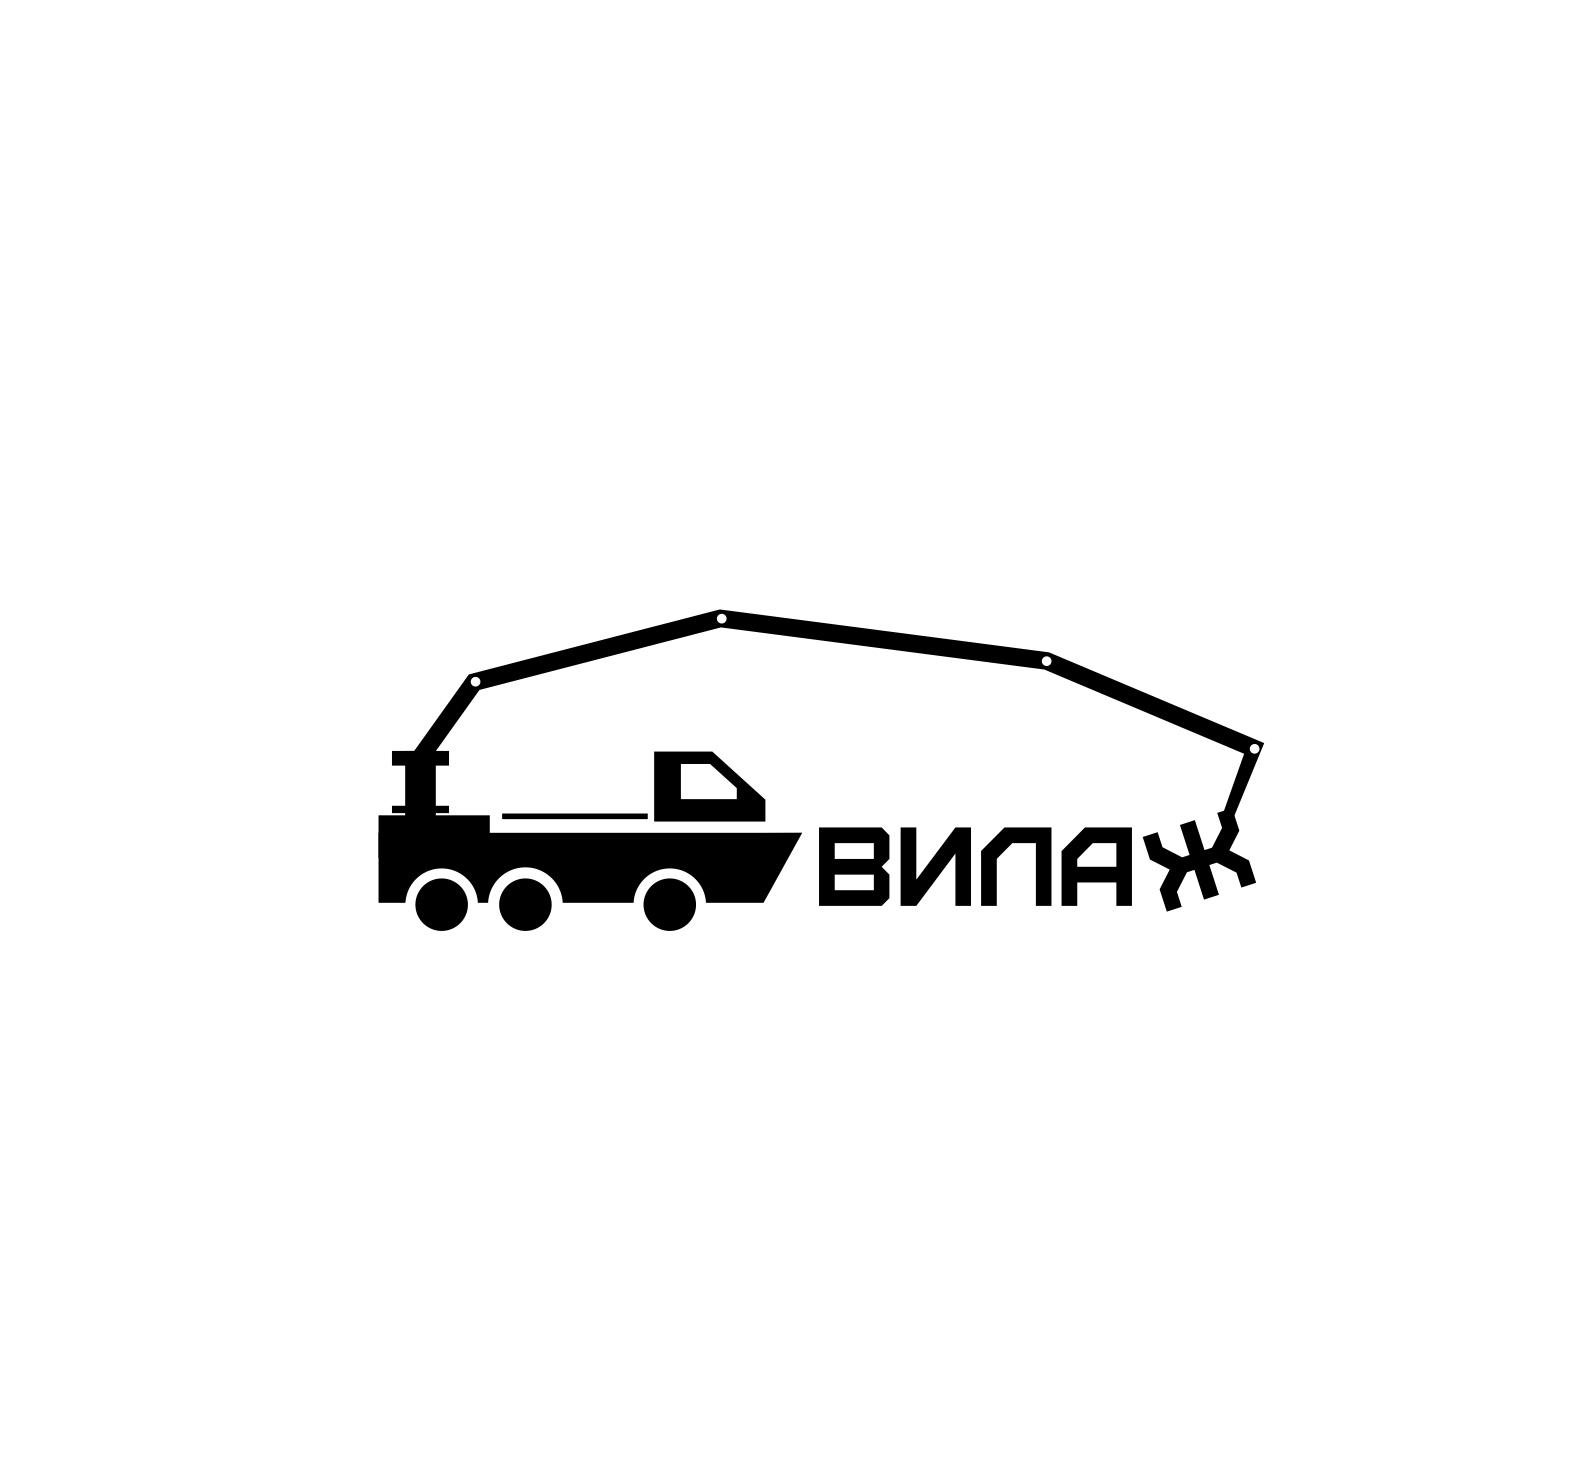 Логотип для компании по аренде спец.техники фото f_027598d6705edeab.jpg